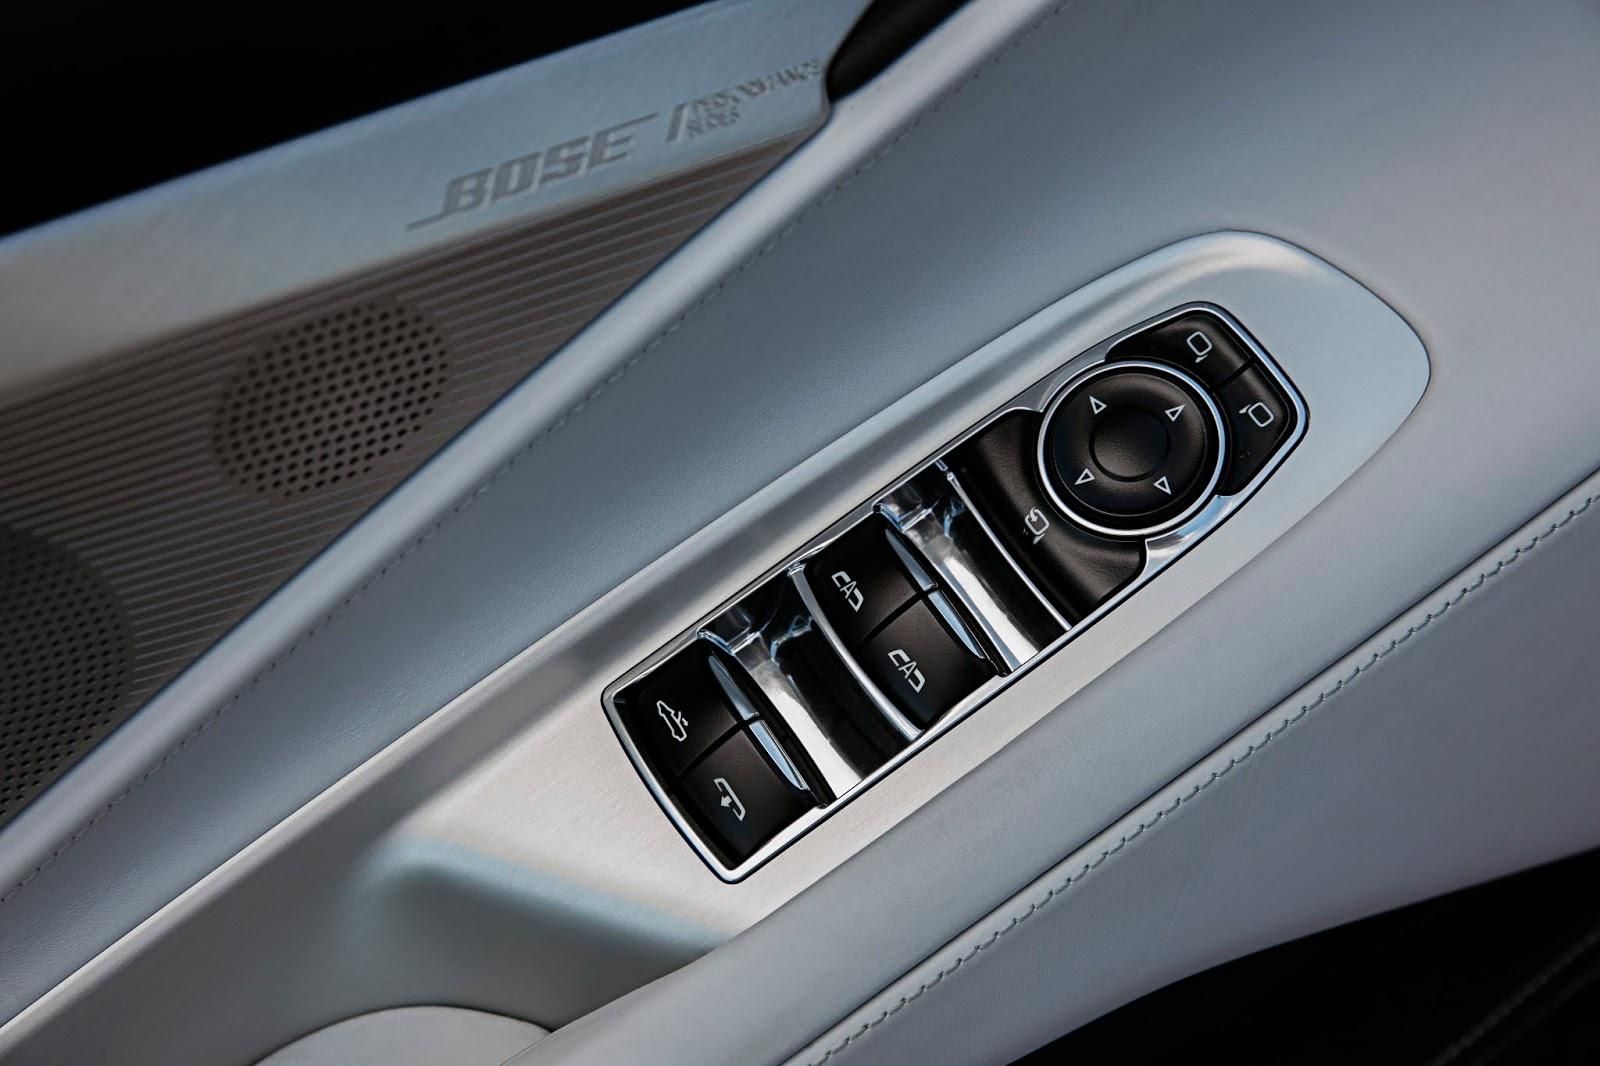 2020 Chevrolet Corvette Stingray Convertible 015 Γιατί η C8 Convertible είναι η καλύτερη Corvette ever C8, Chevrolet, Chevrolet Corvette, Corvette, zblog, ειδήσεις, καινούργιο, καινούρια, καινούριο